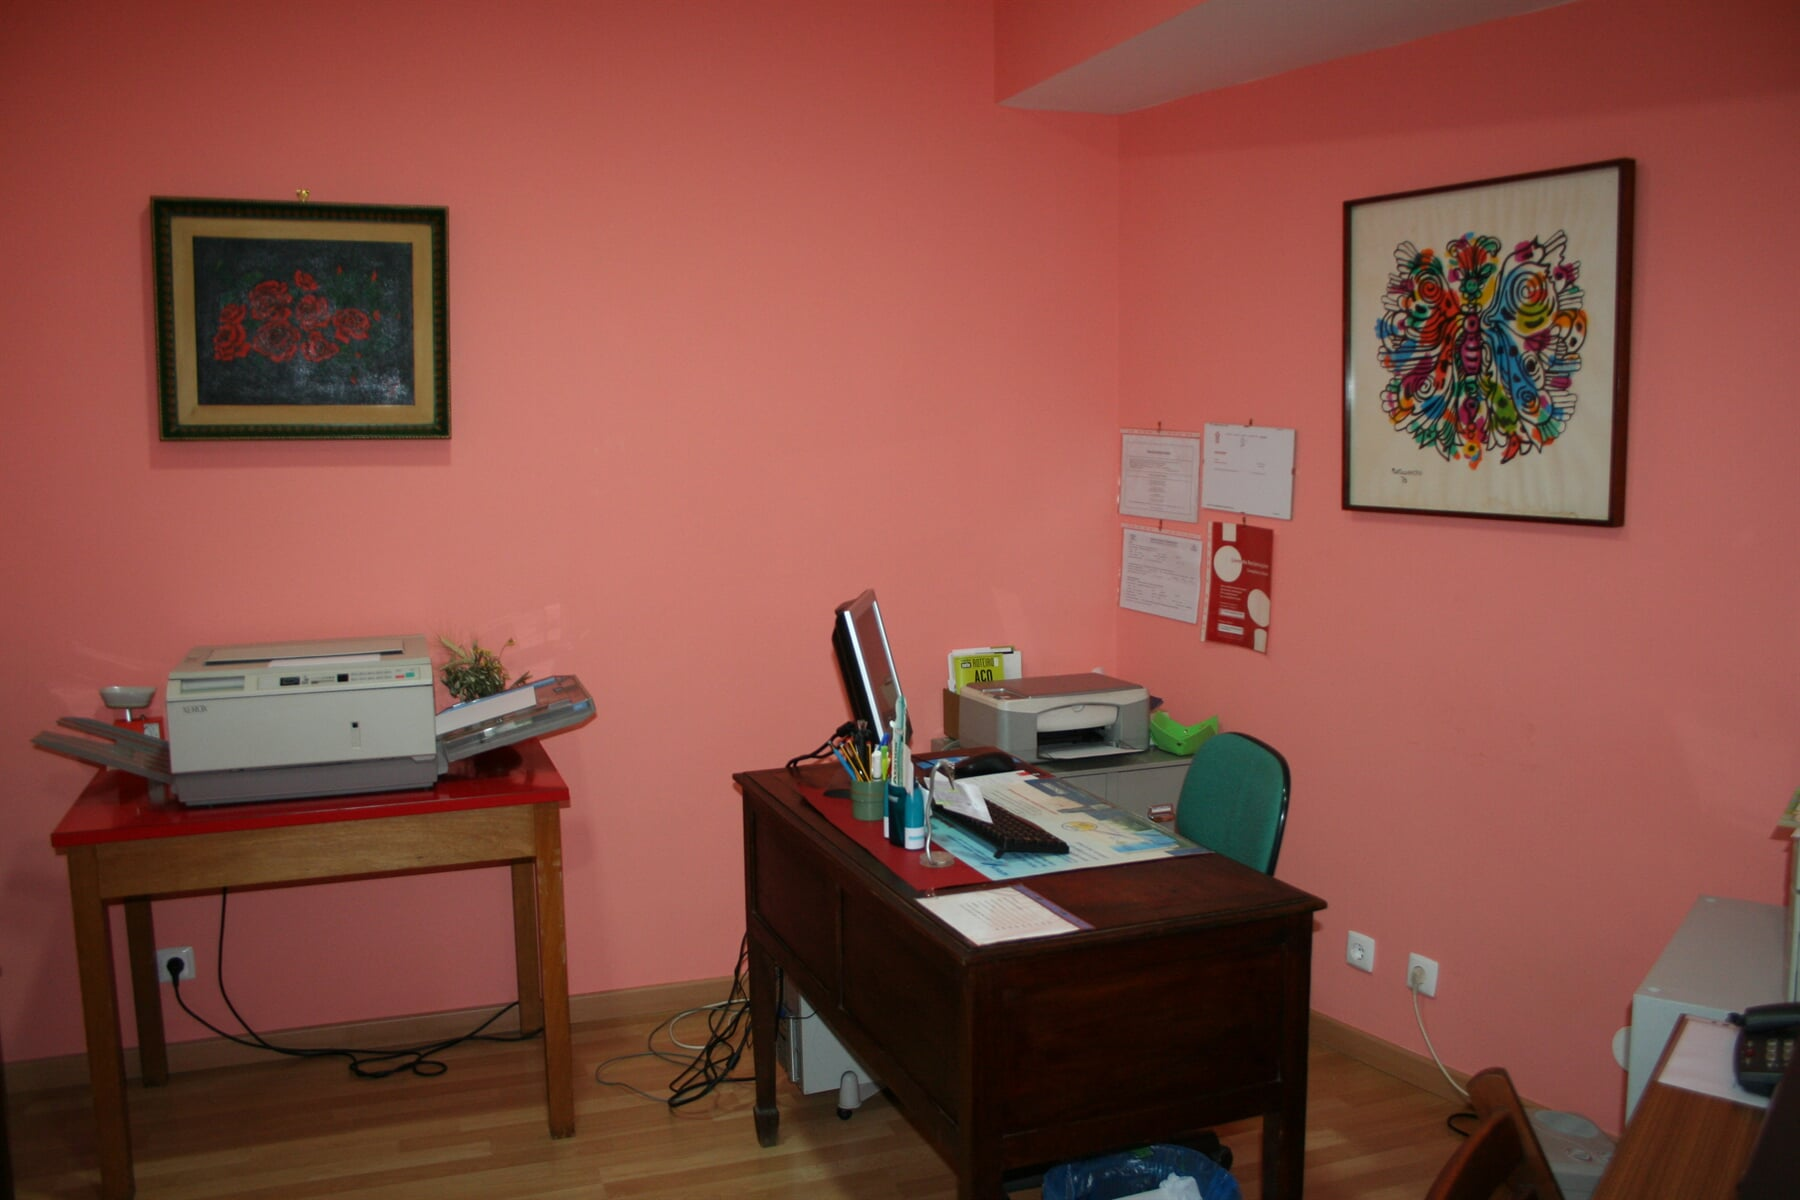 consultório de imunoalergologia 4